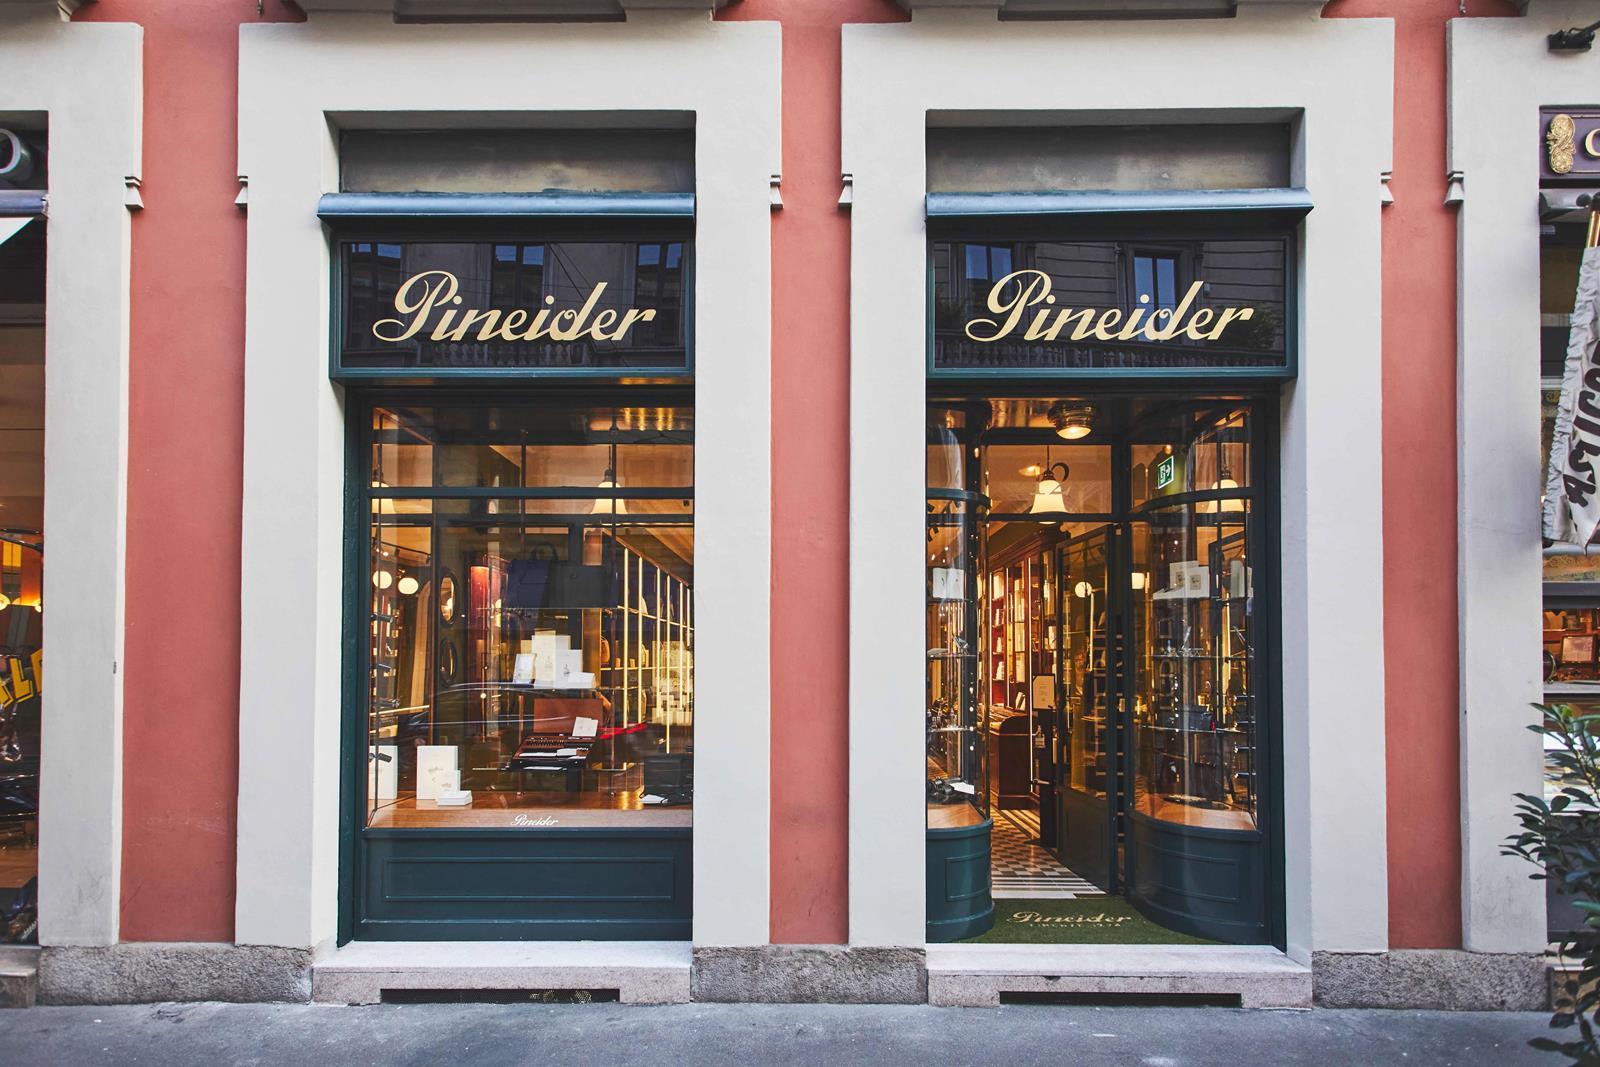 Pineider Via Manzoni, 12 Milano